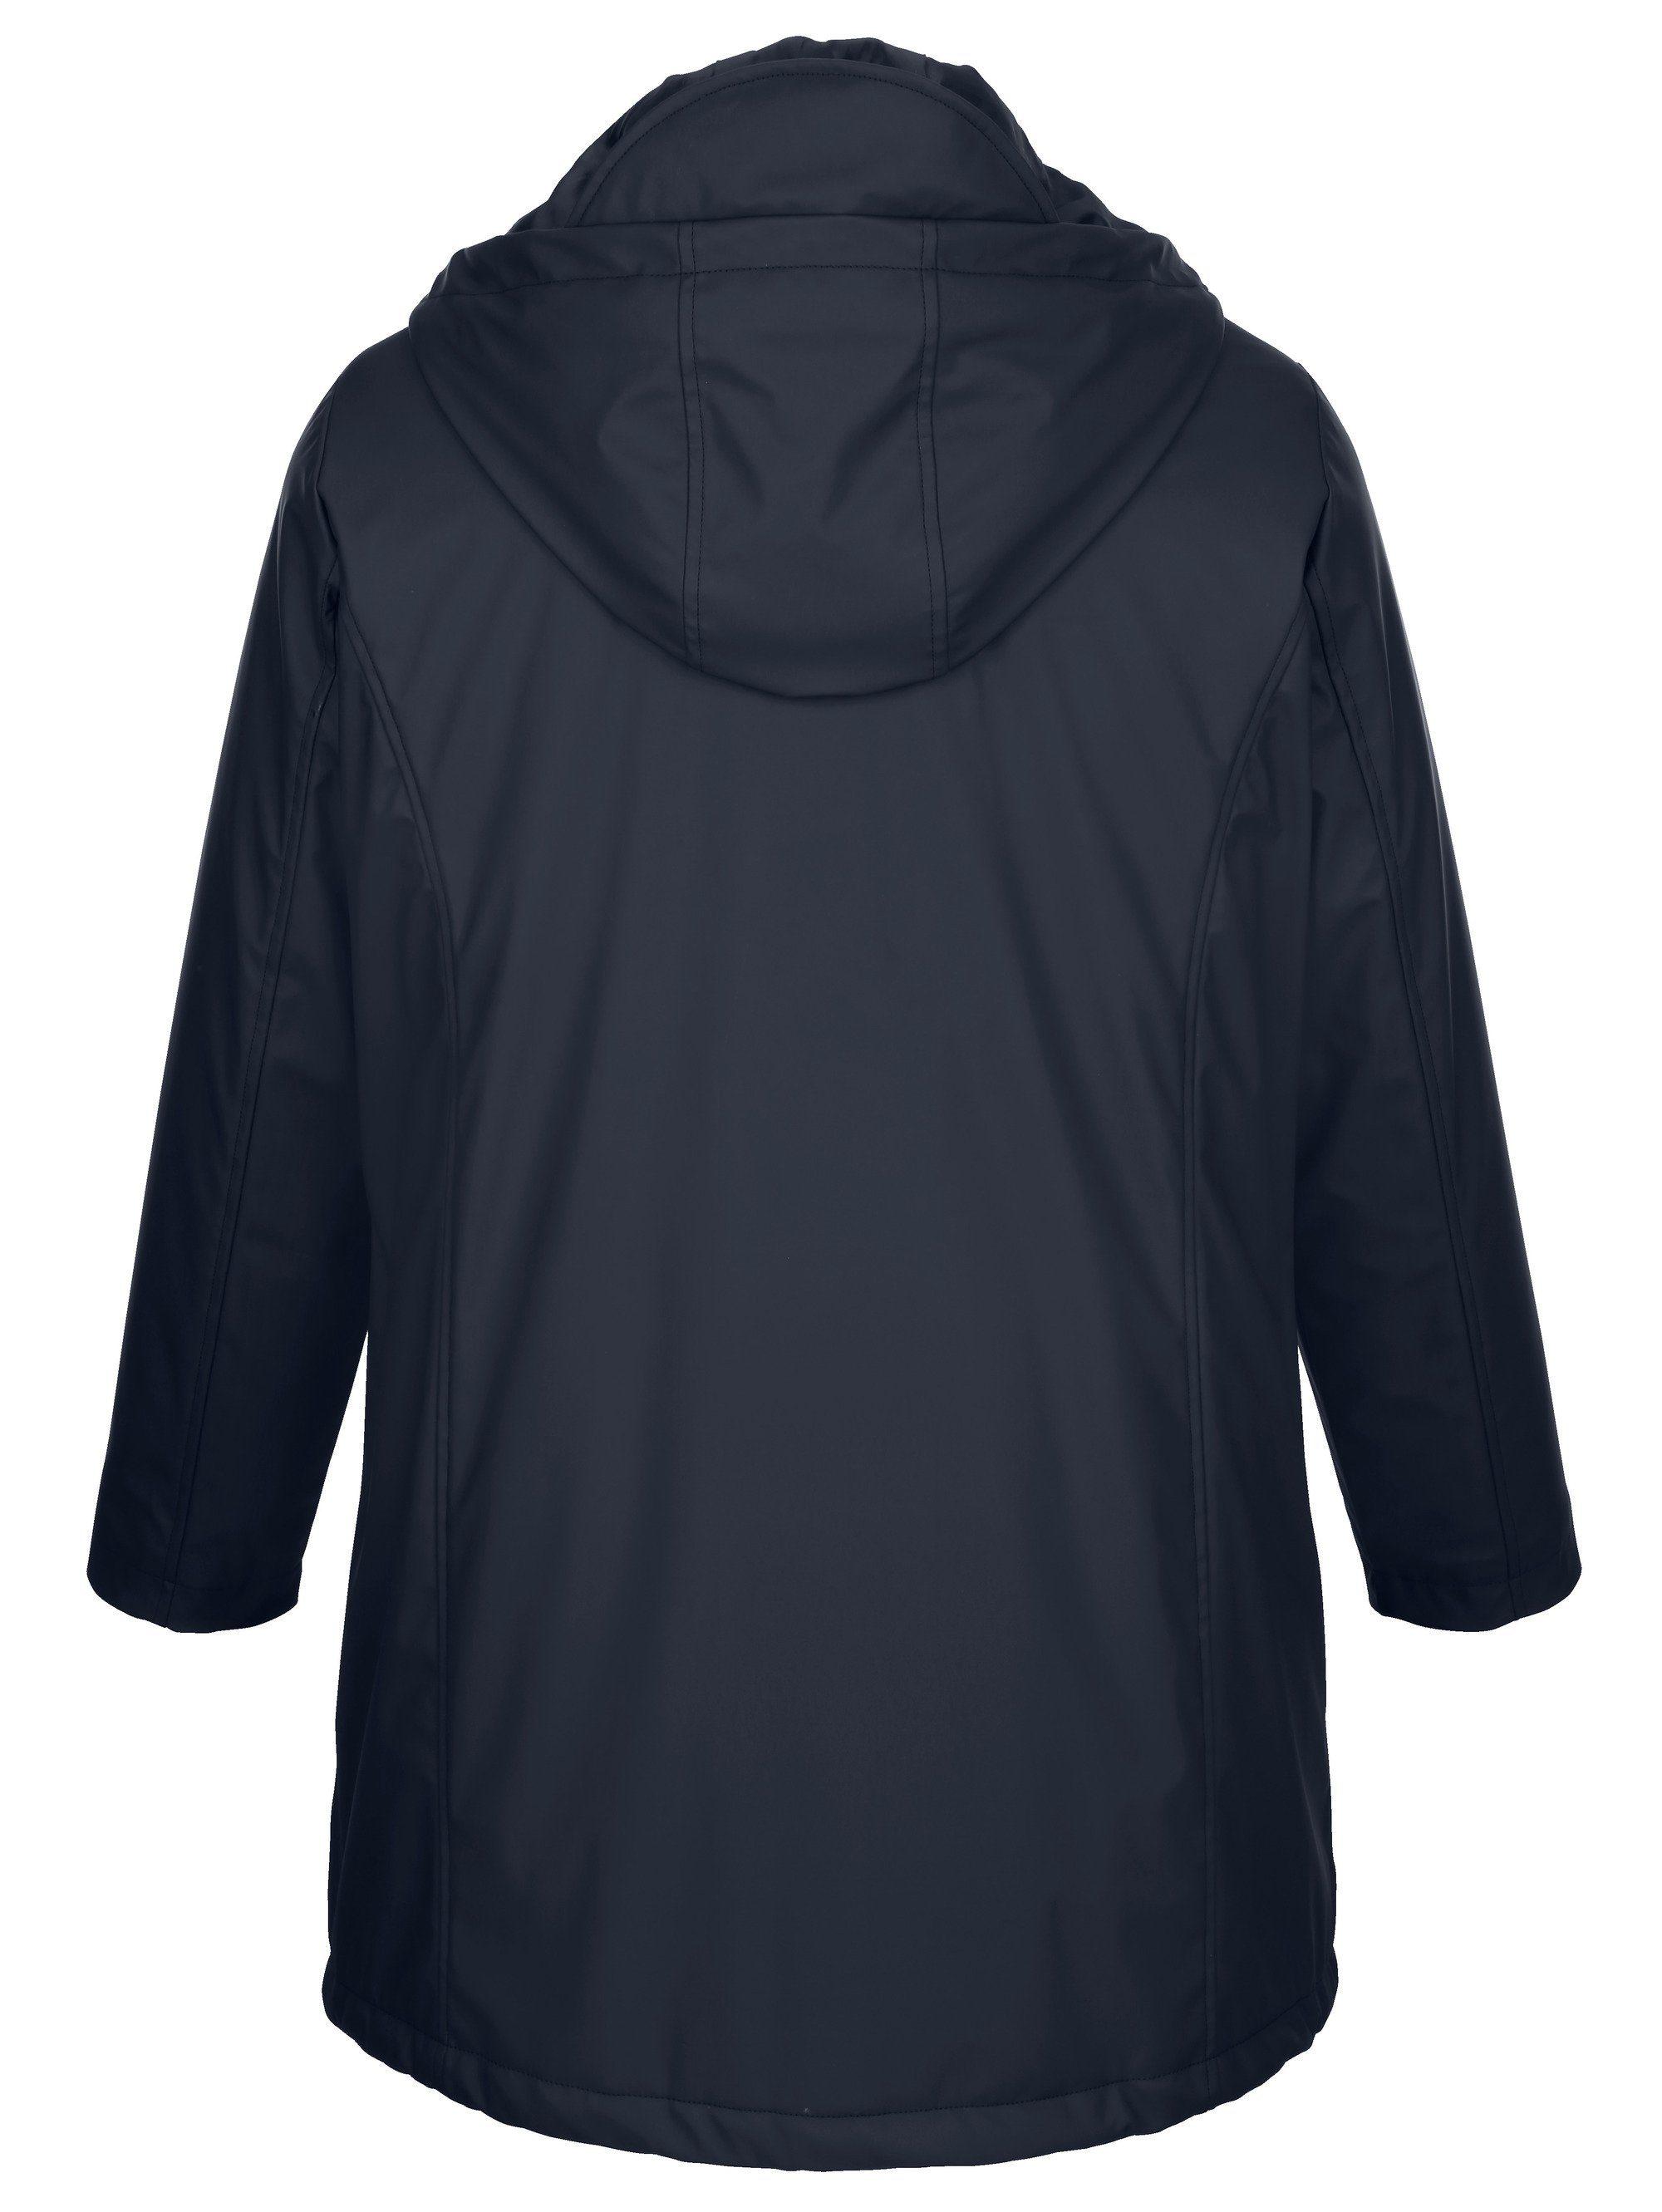 miamoda -  Regenjacke mit Umlegekragen und Kapuze